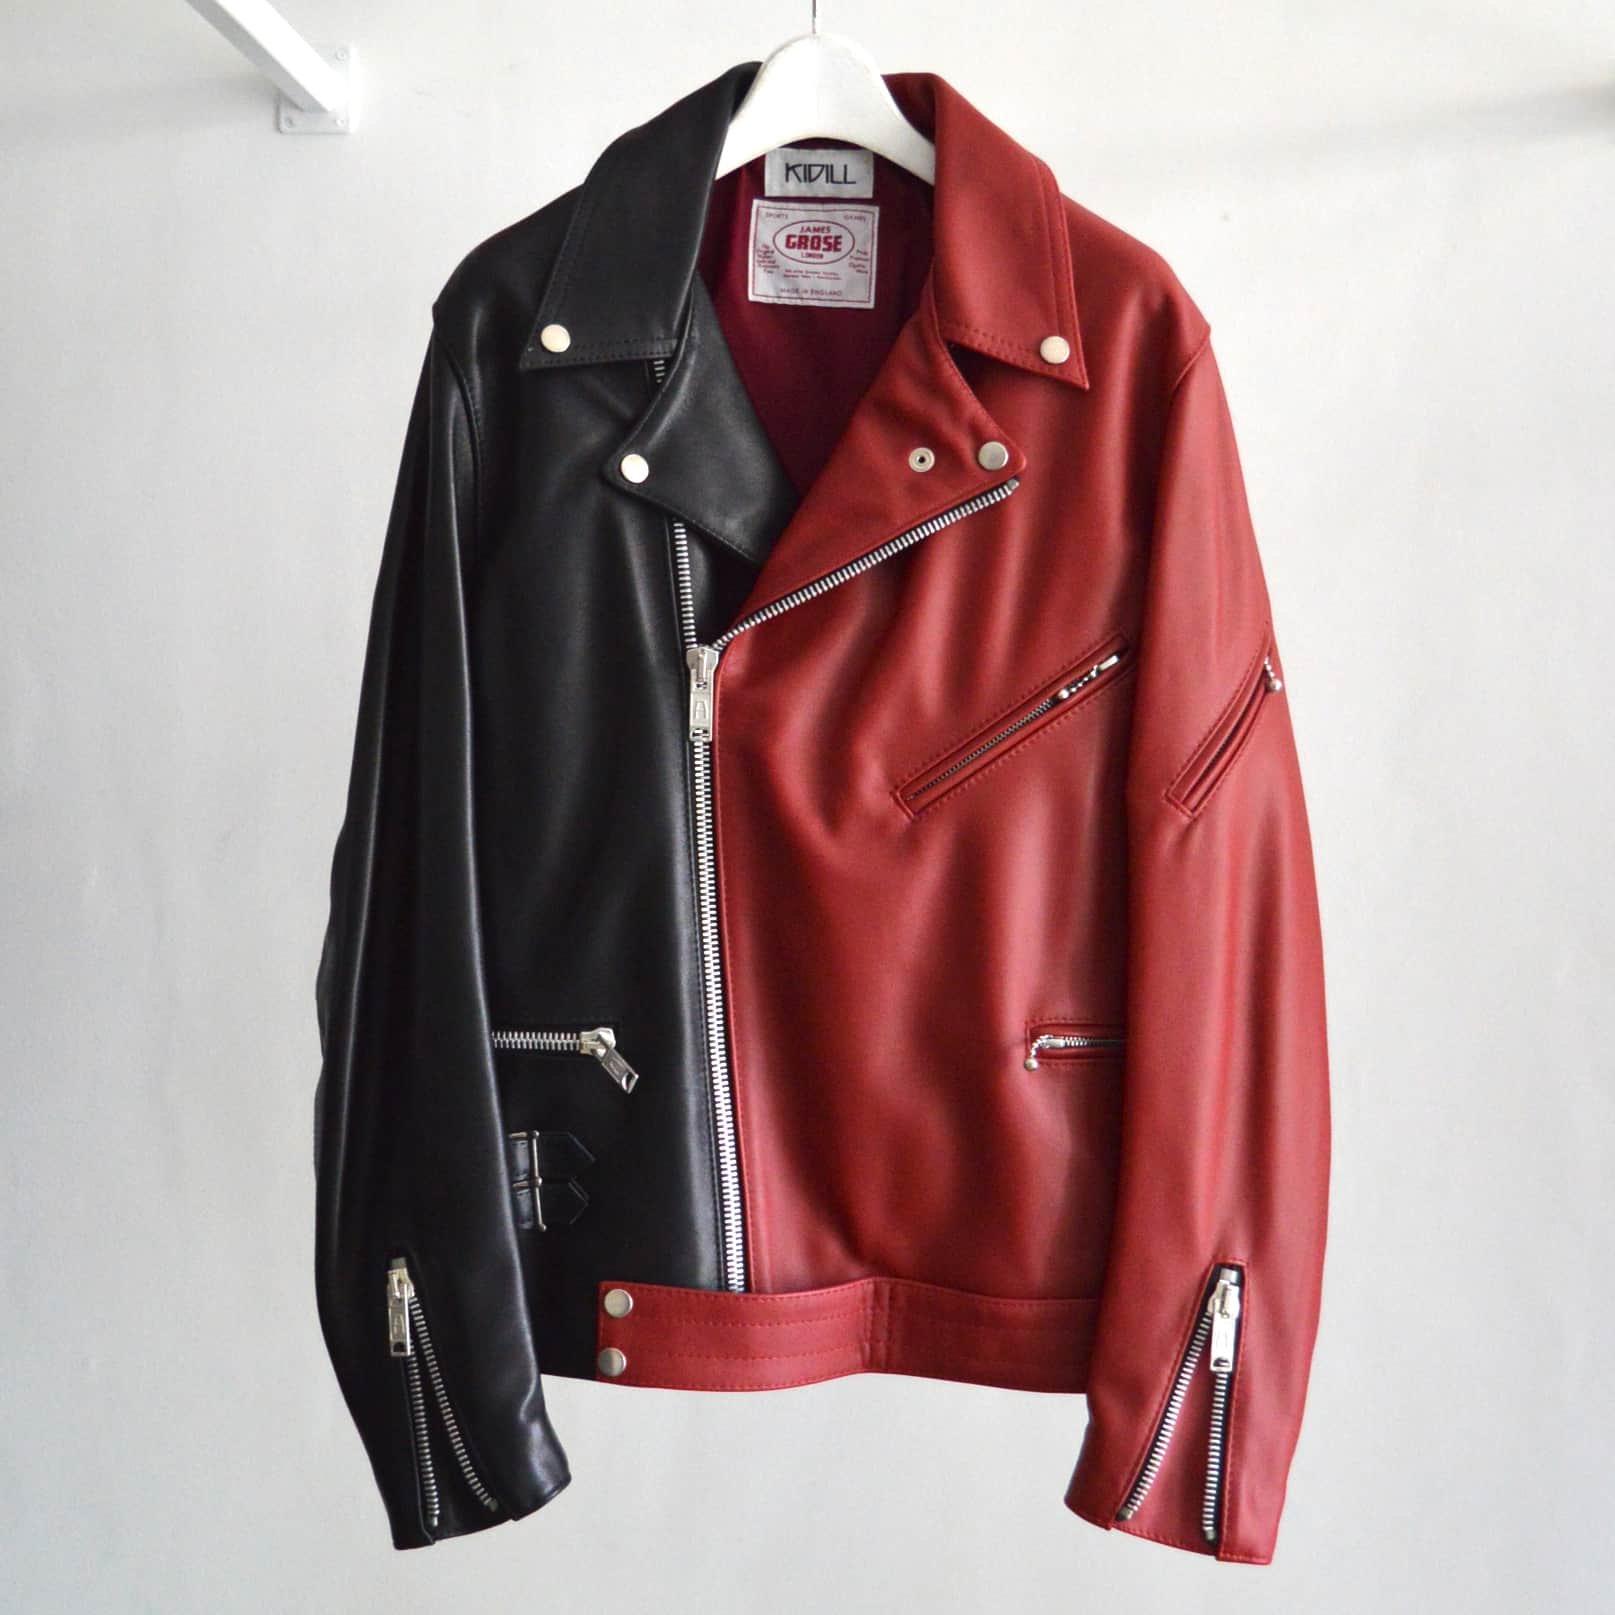 【KIDILL×JAMES GROSE LODON】MANILA & GEORGIAN Docking Leather Riders Jacket